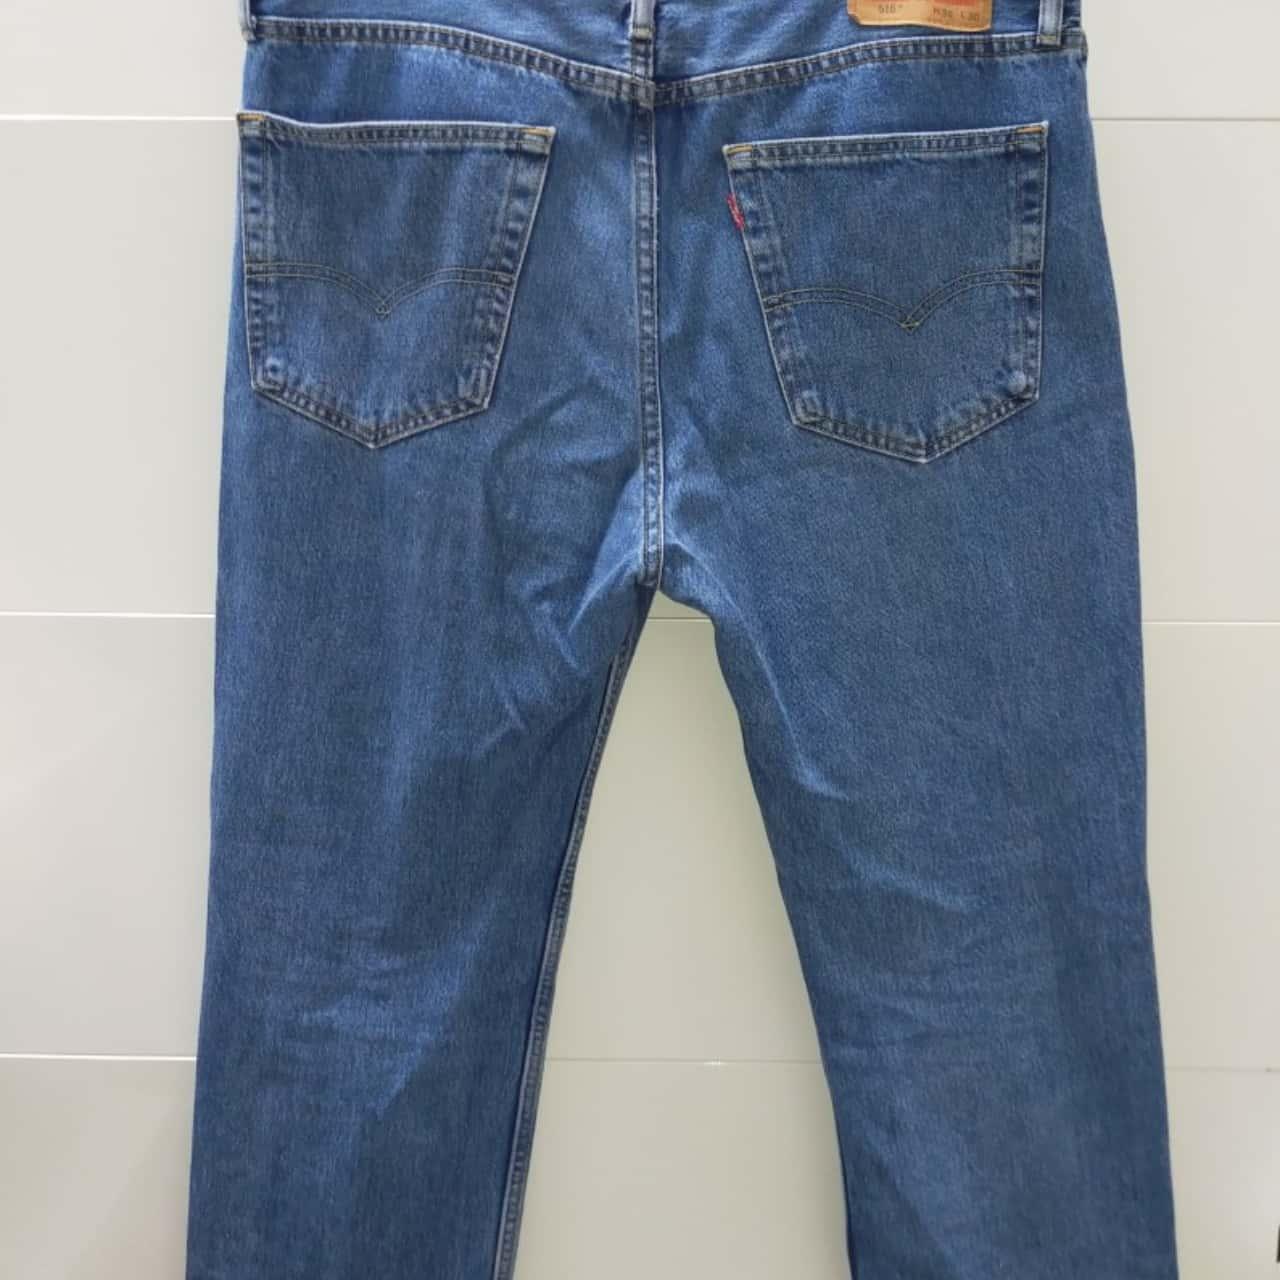 Levis Mens Size 36 Straight Jeans Blue